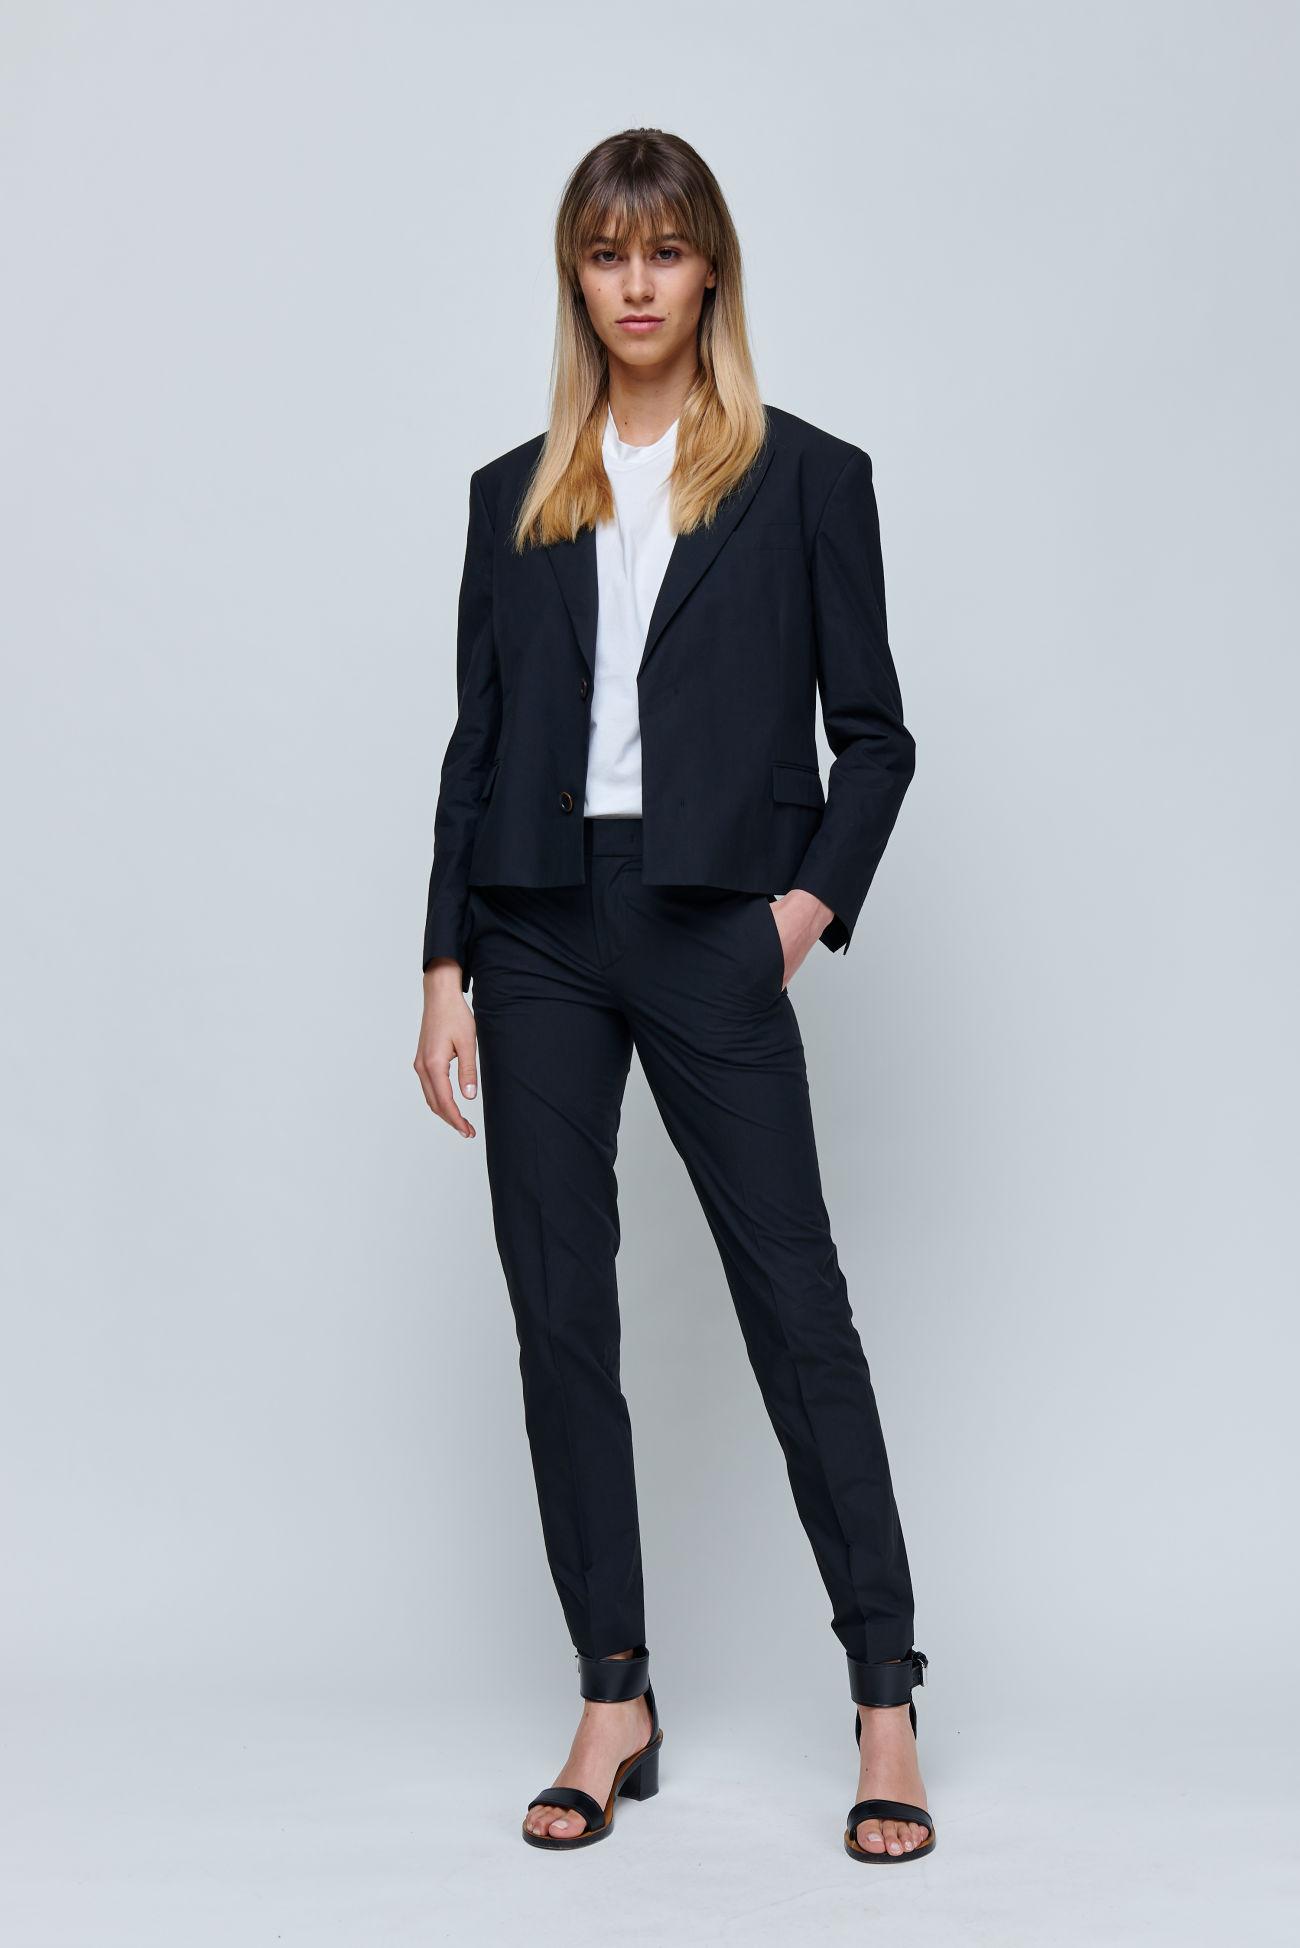 Short boxy blazer made of summery cotton